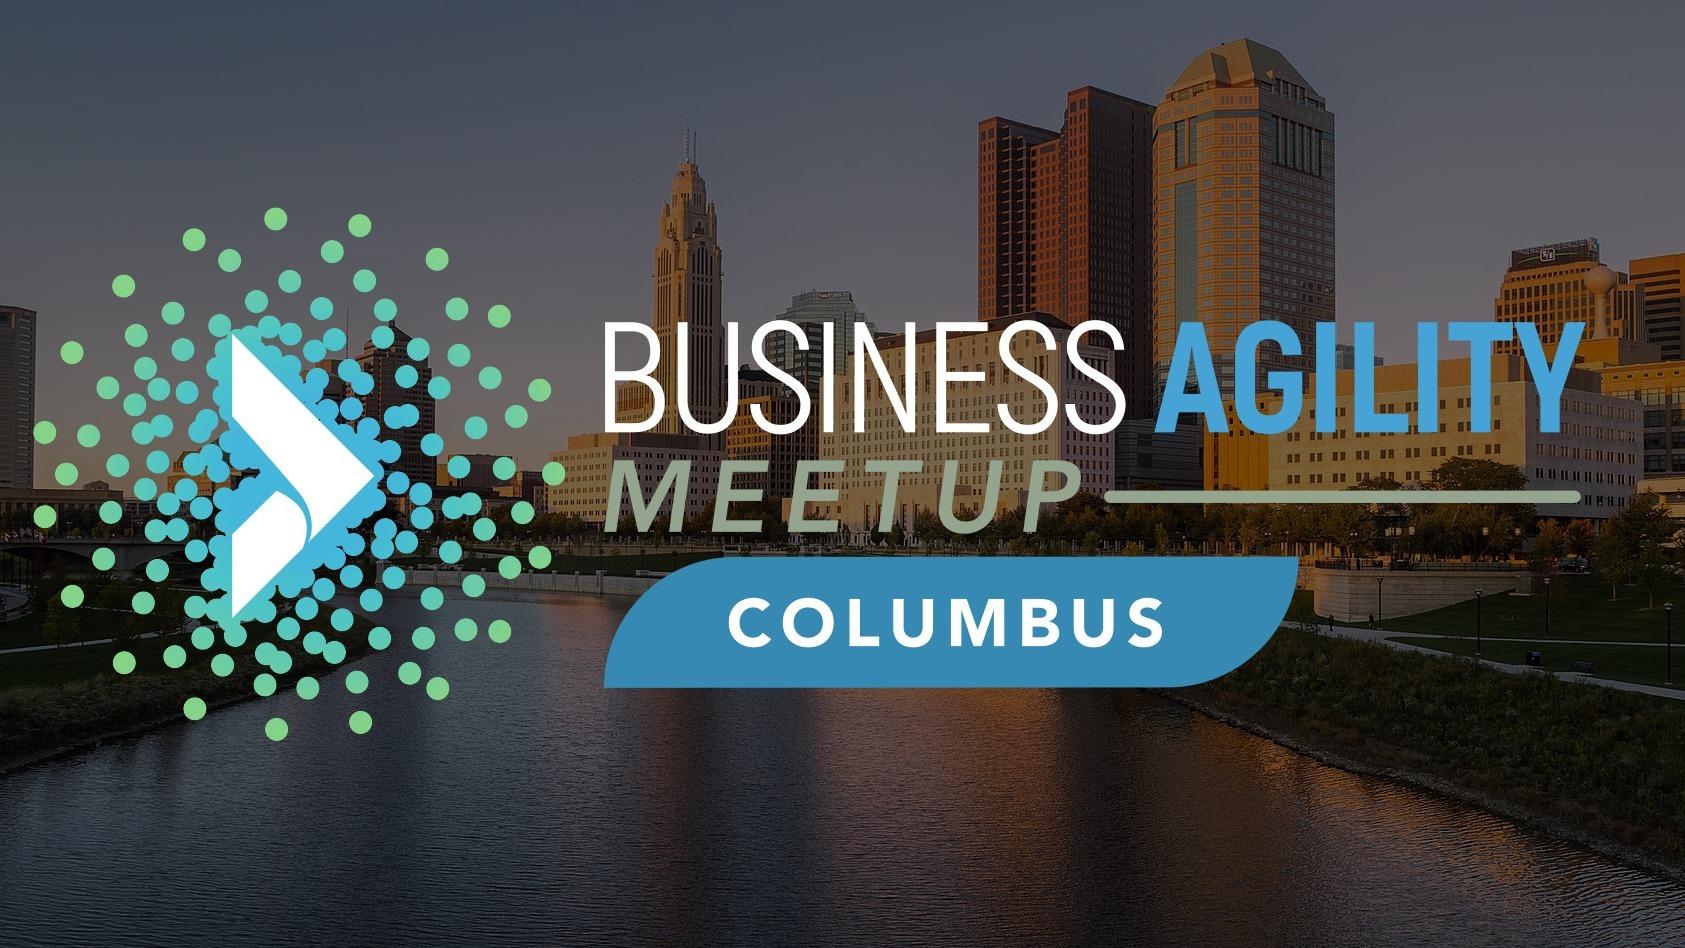 Columbus Business Agility